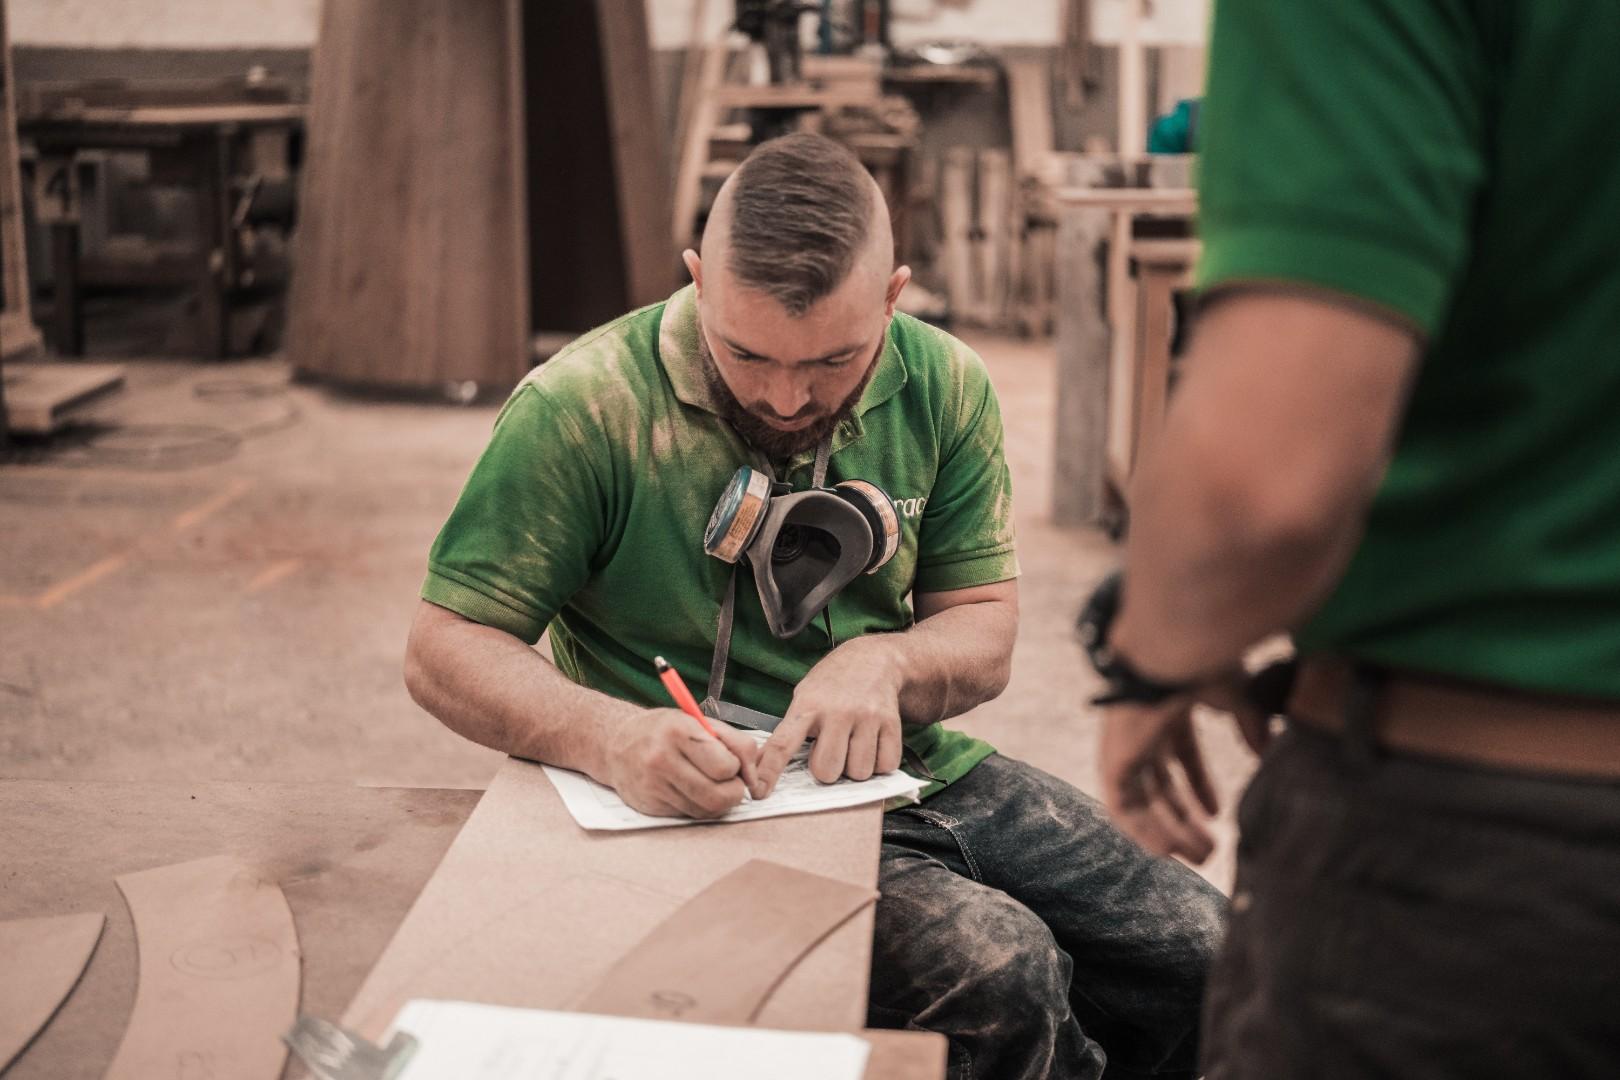 man-in-green-crew-neck-t-shirt-writing-on-white-paper-3637788.jpg